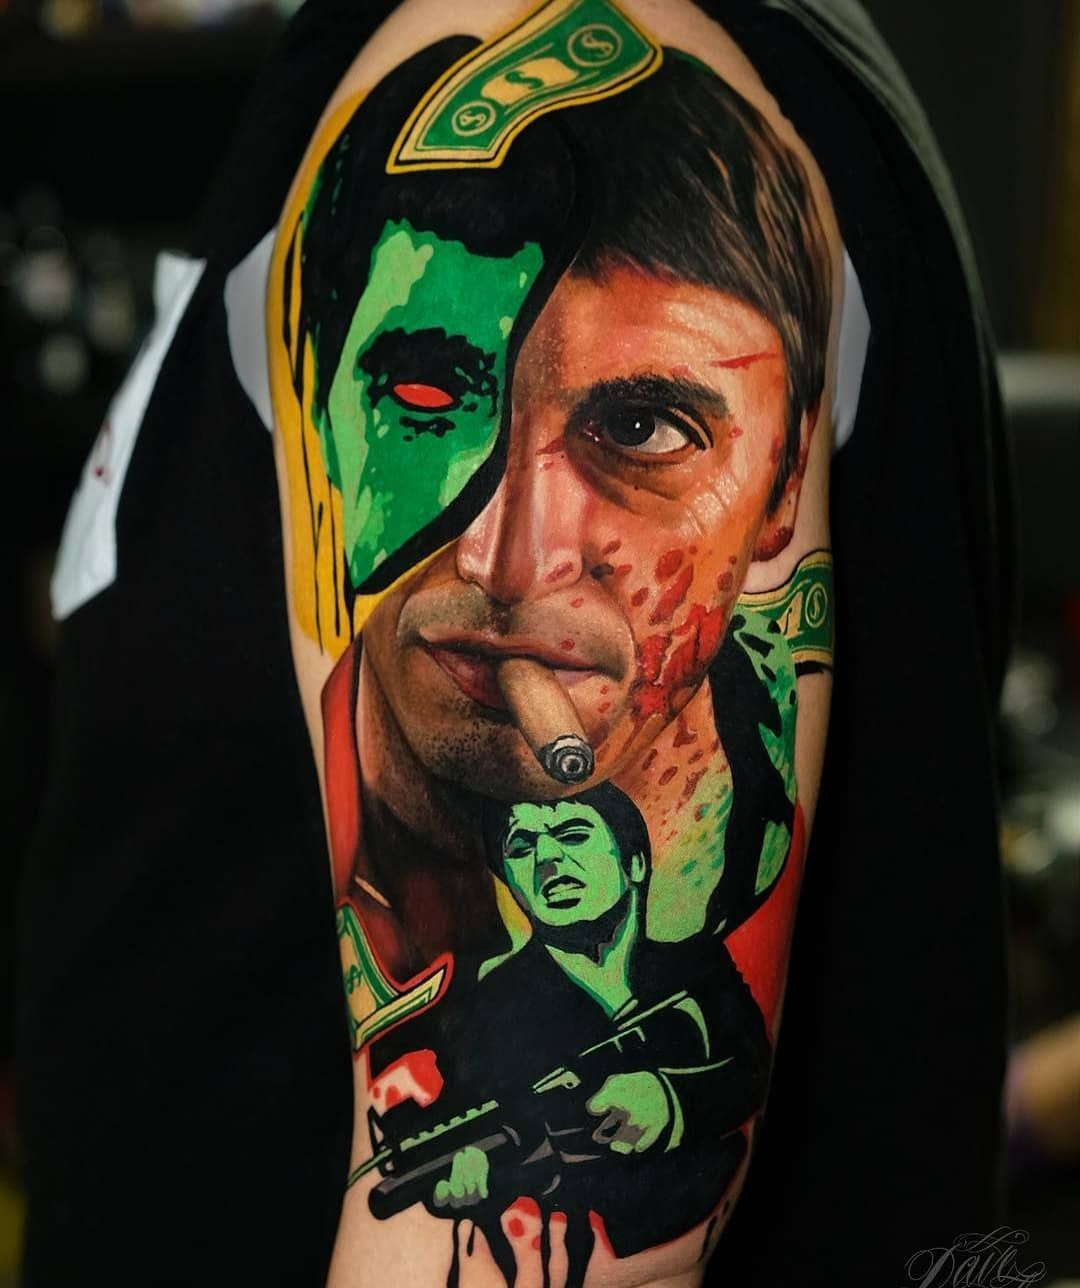 Beautiful Colored Sleeve Tattoo Sleeve Tattoos Pop Art Tattoos Portrait